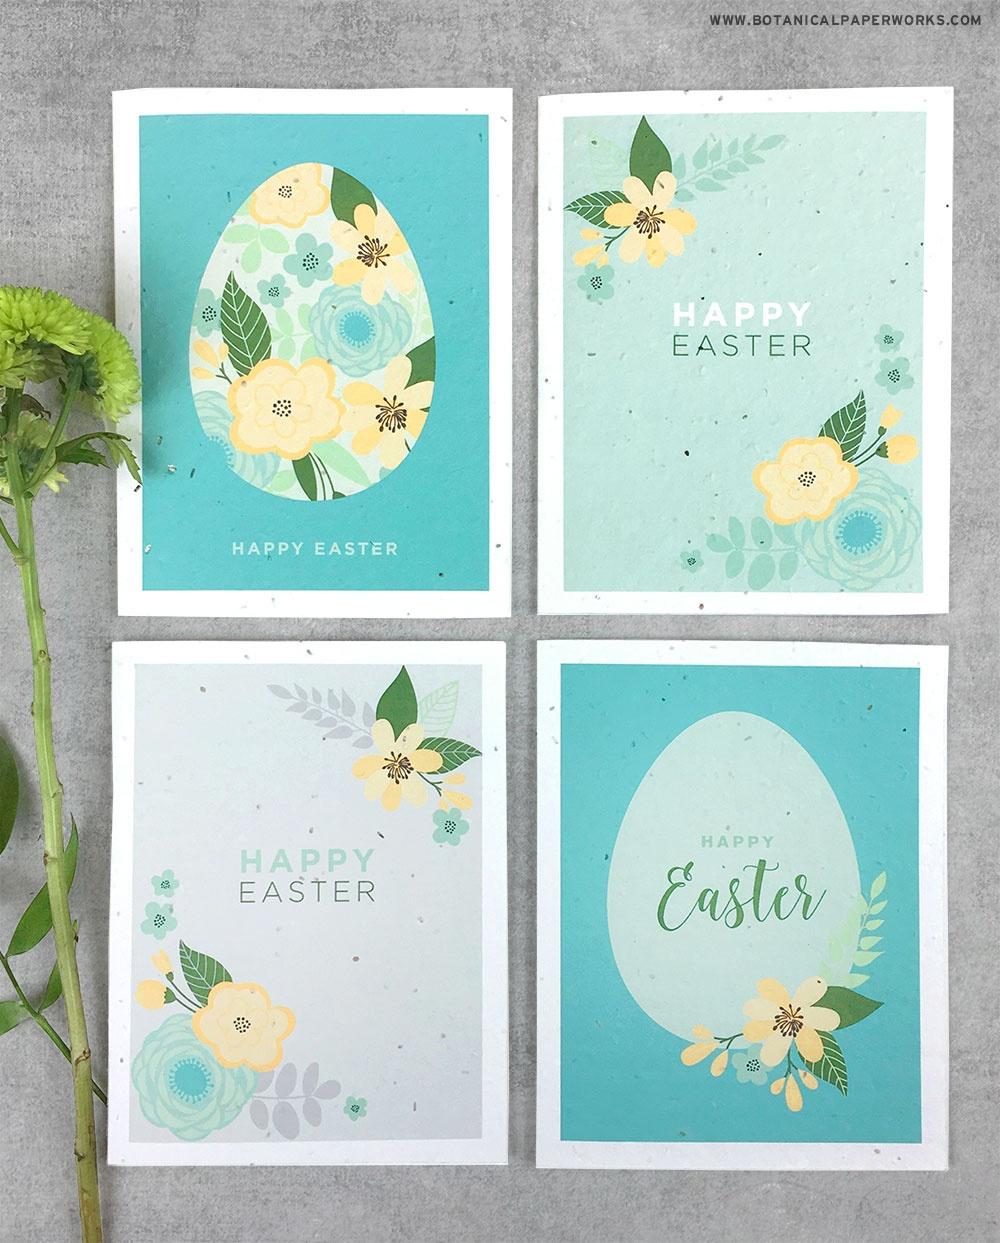 Free Printable} Easter Cards | Blog | Botanical Paperworks - Printable Easter Greeting Cards Free